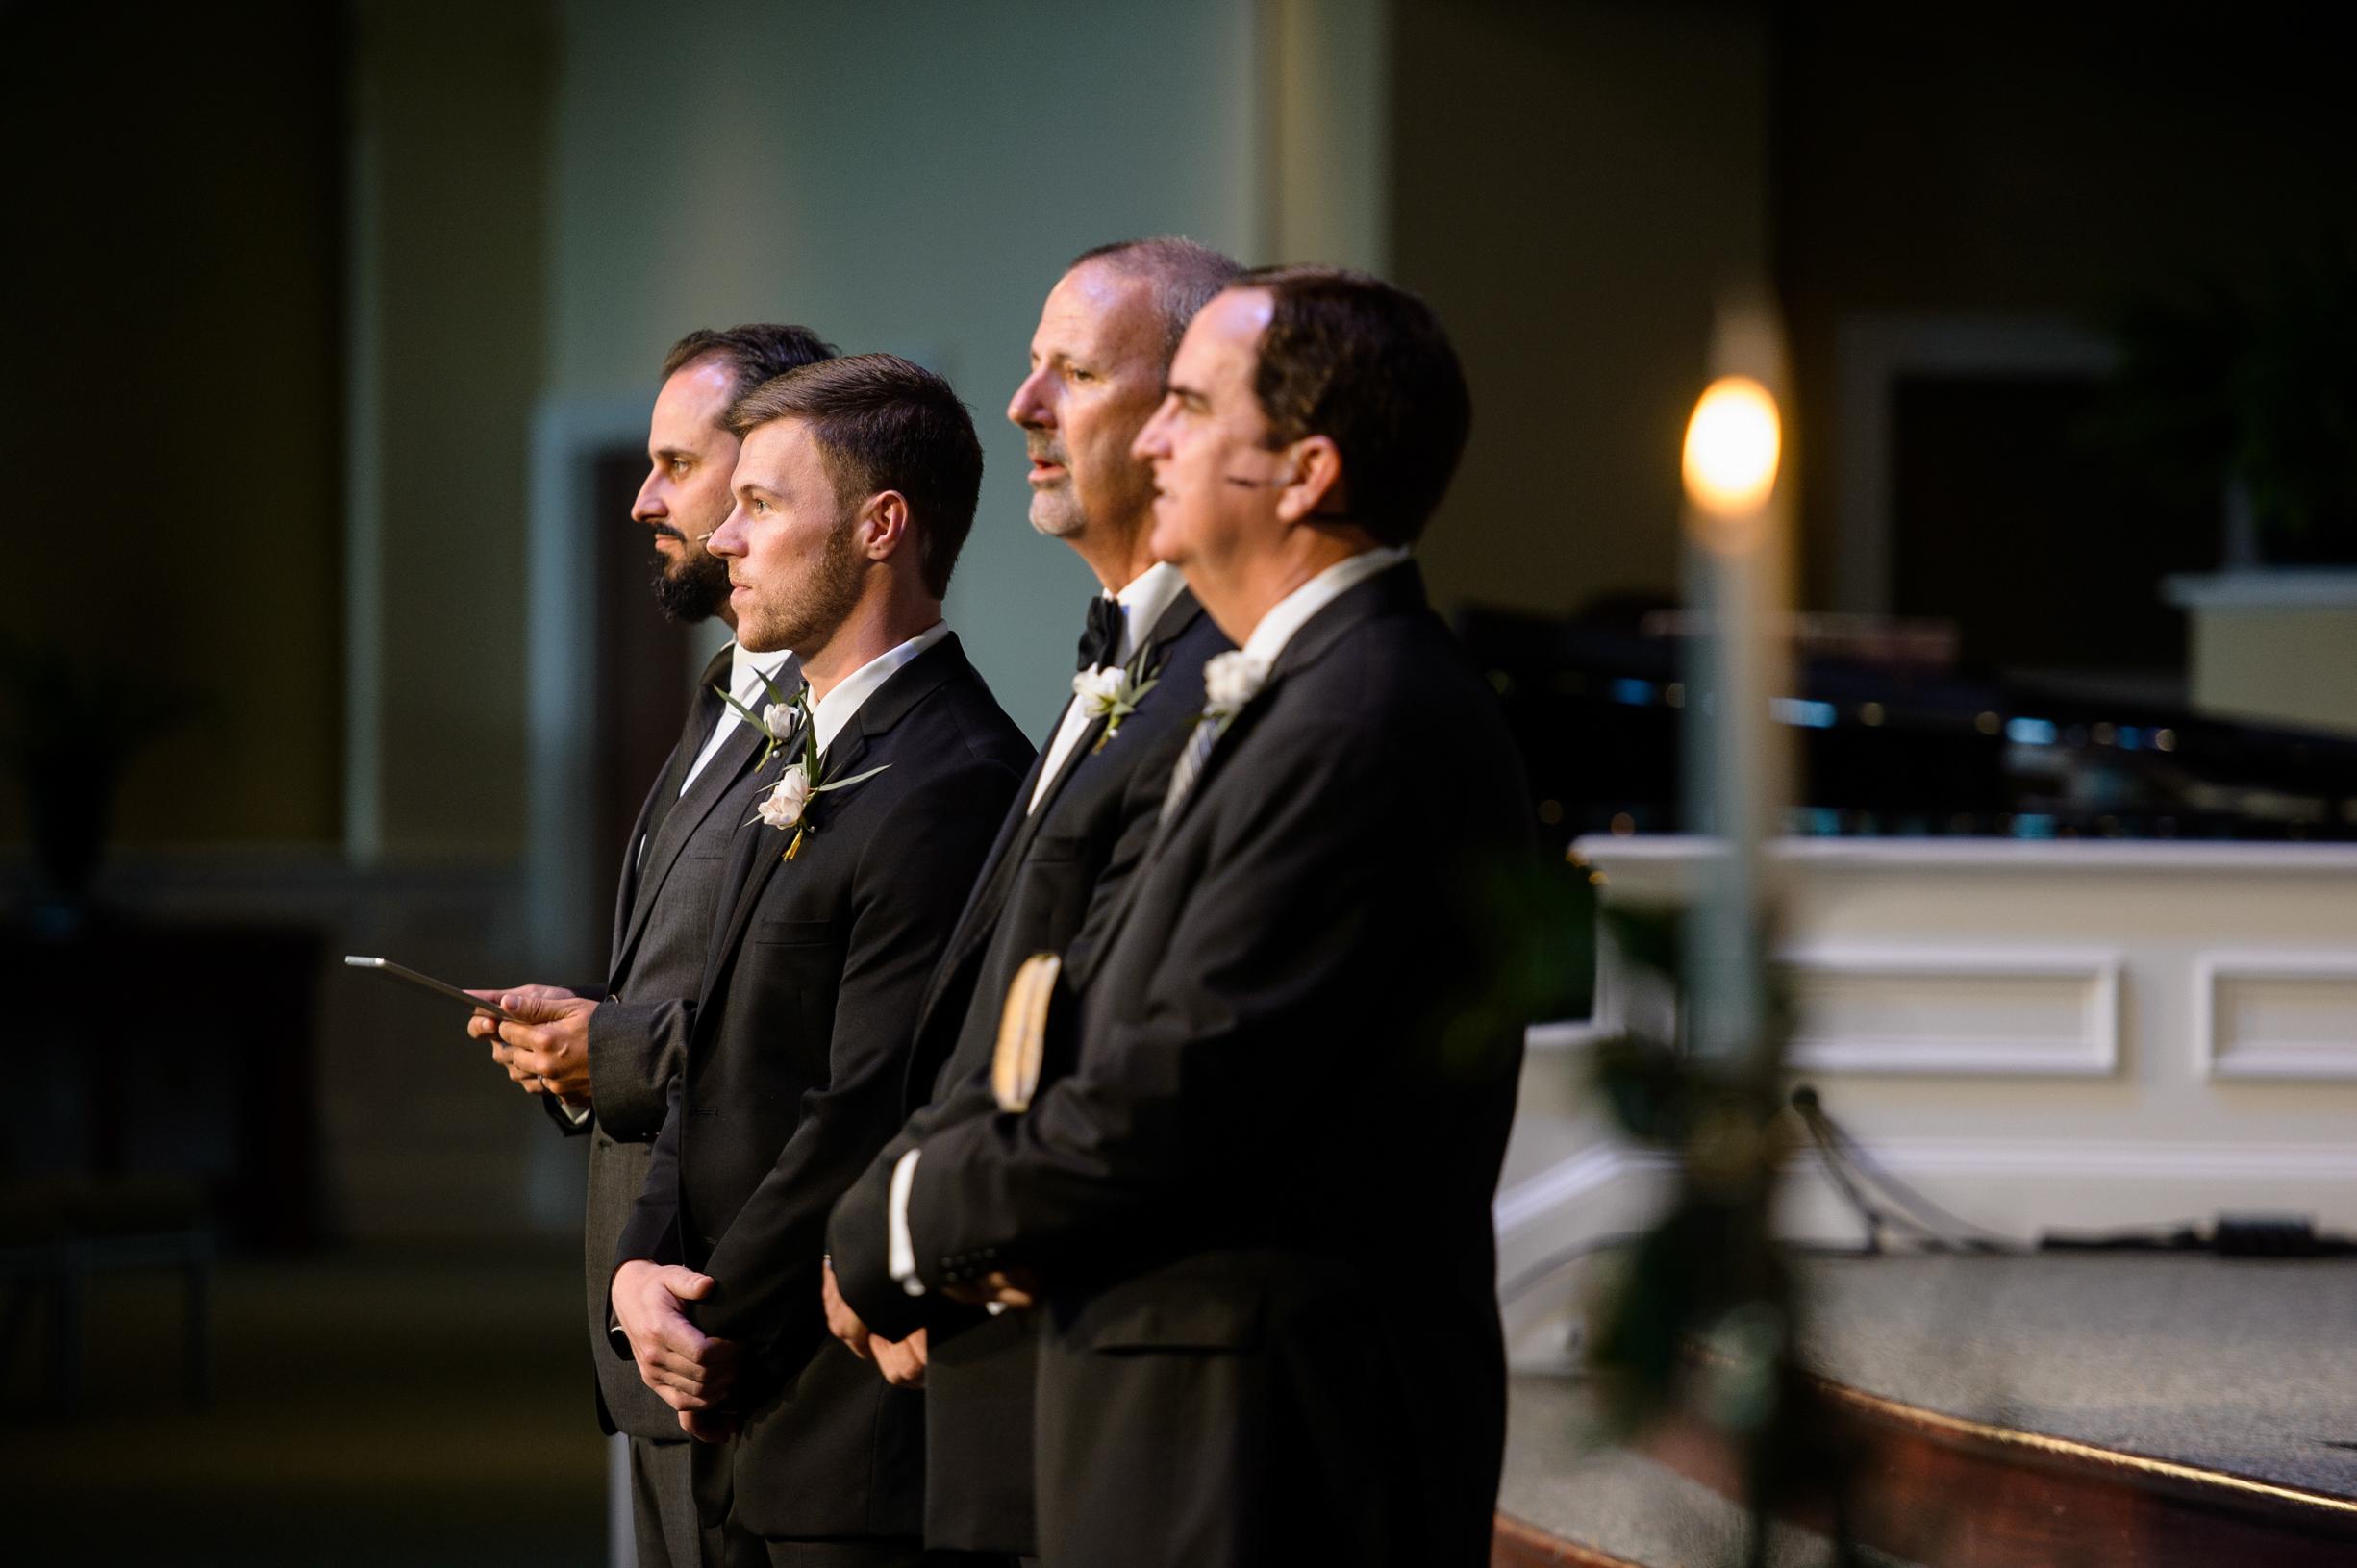 Royal Wedding with Outdoor Reception-36.JPG